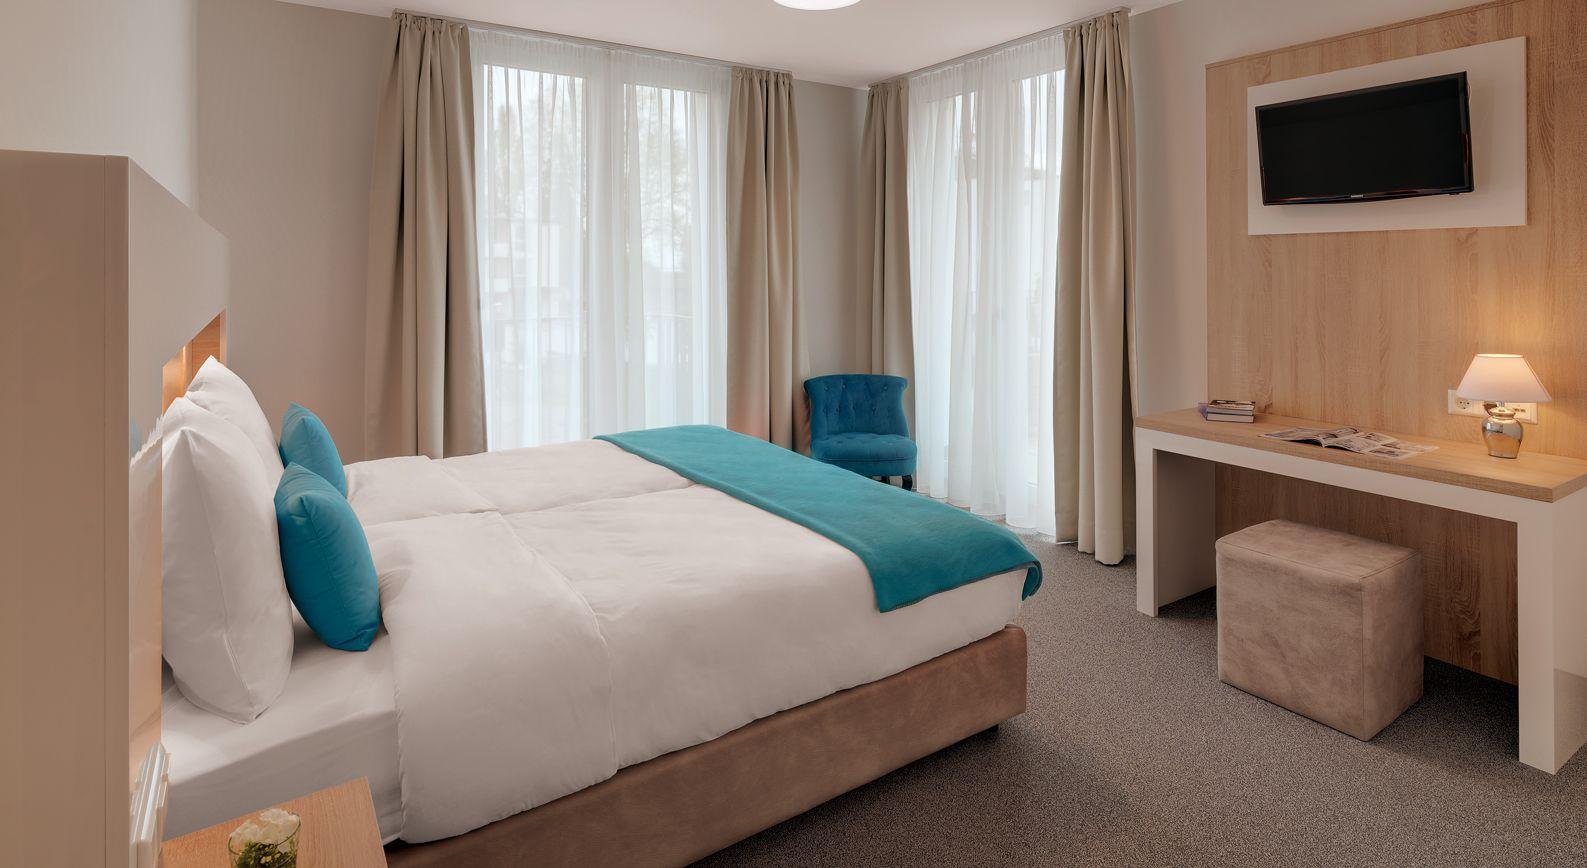 Pension und hotel seereich in lindau for Designhotel lindau